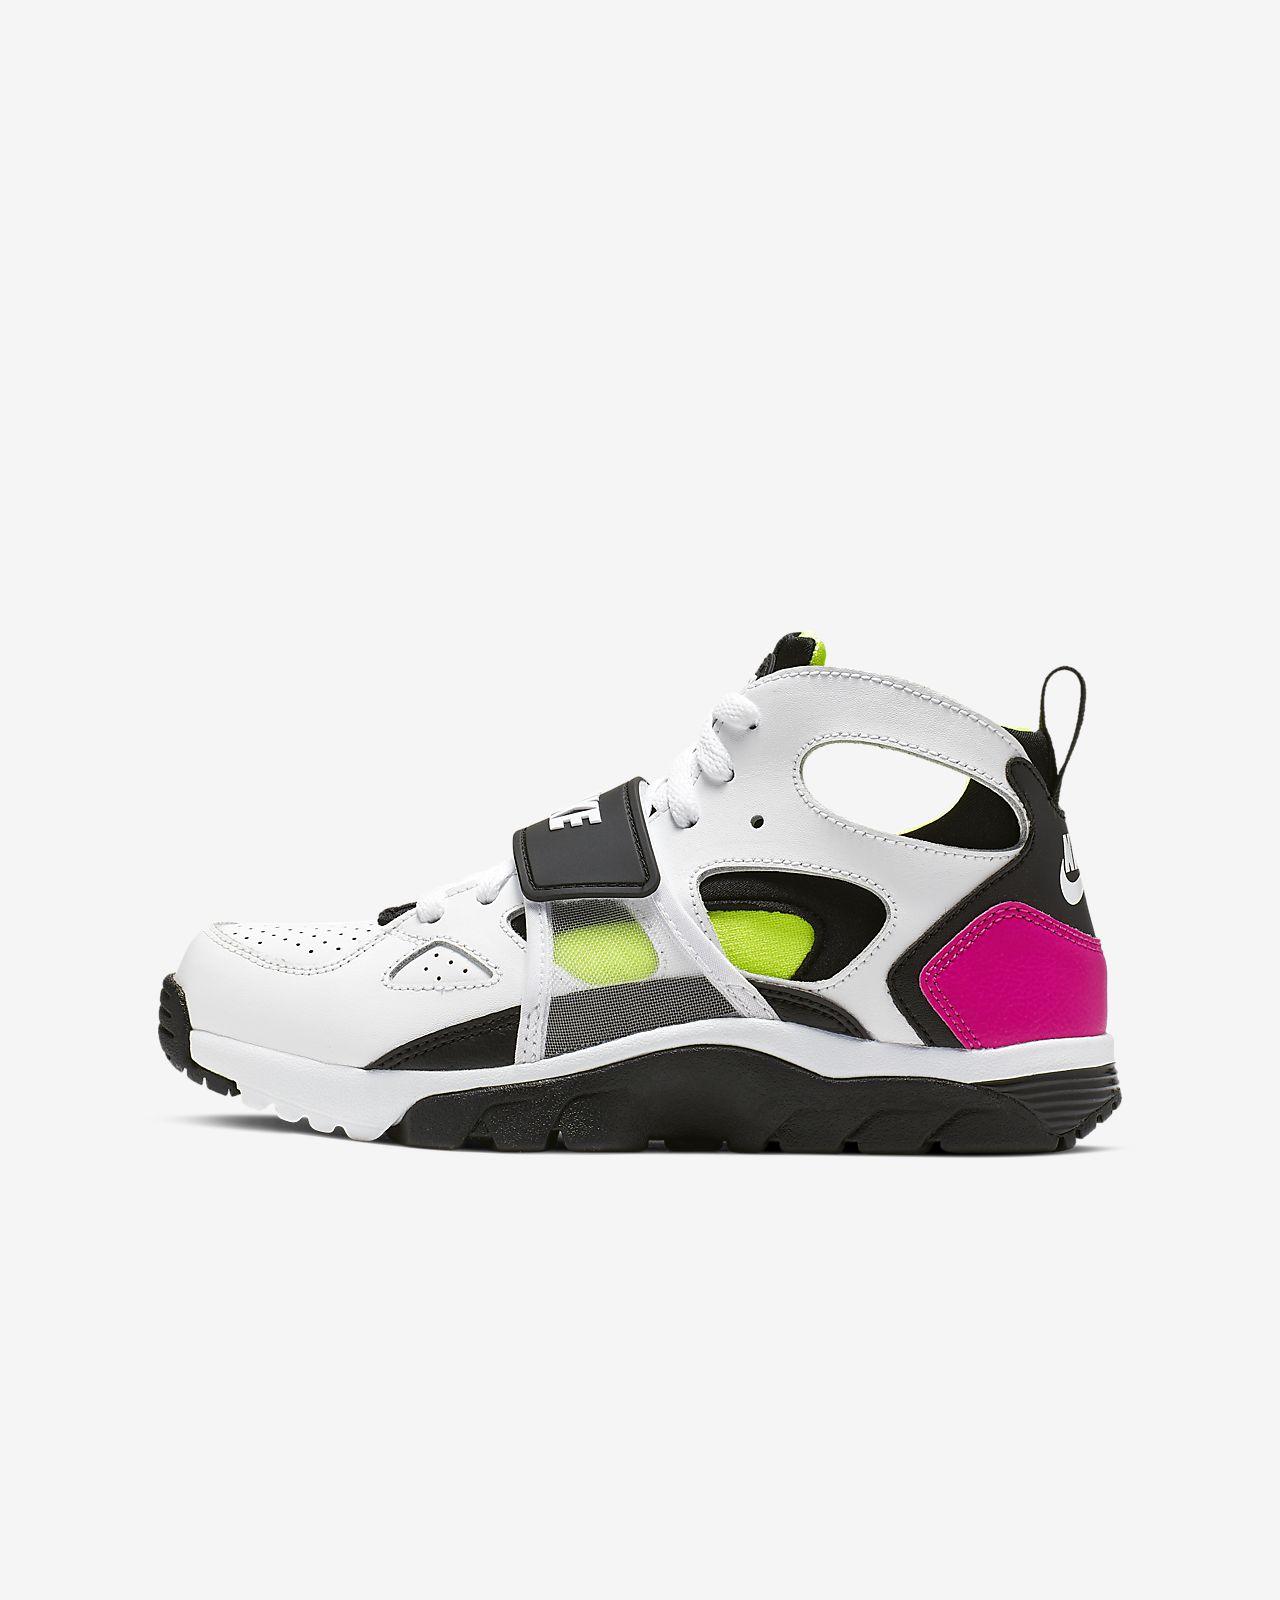 Nike Trainer Huarache Big Kids' Shoe